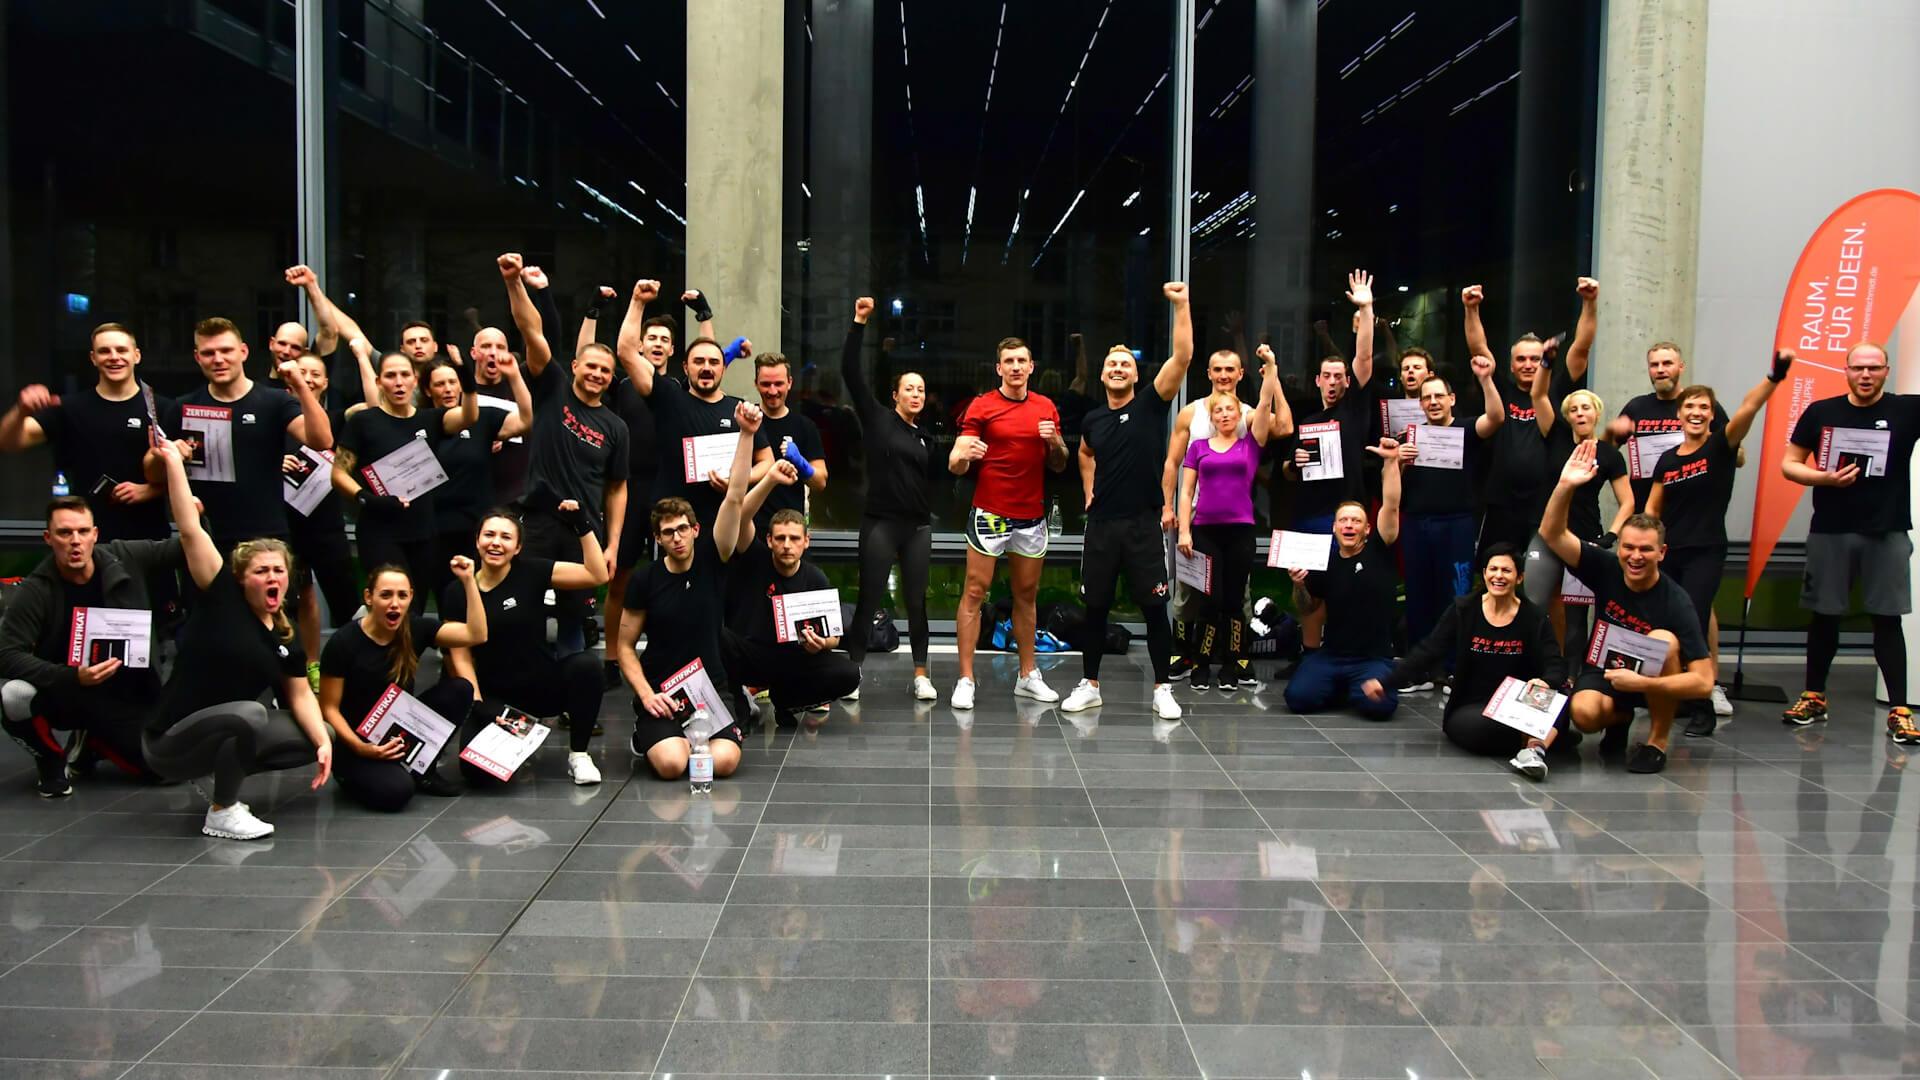 Sportakademie Baumann Kickboxen